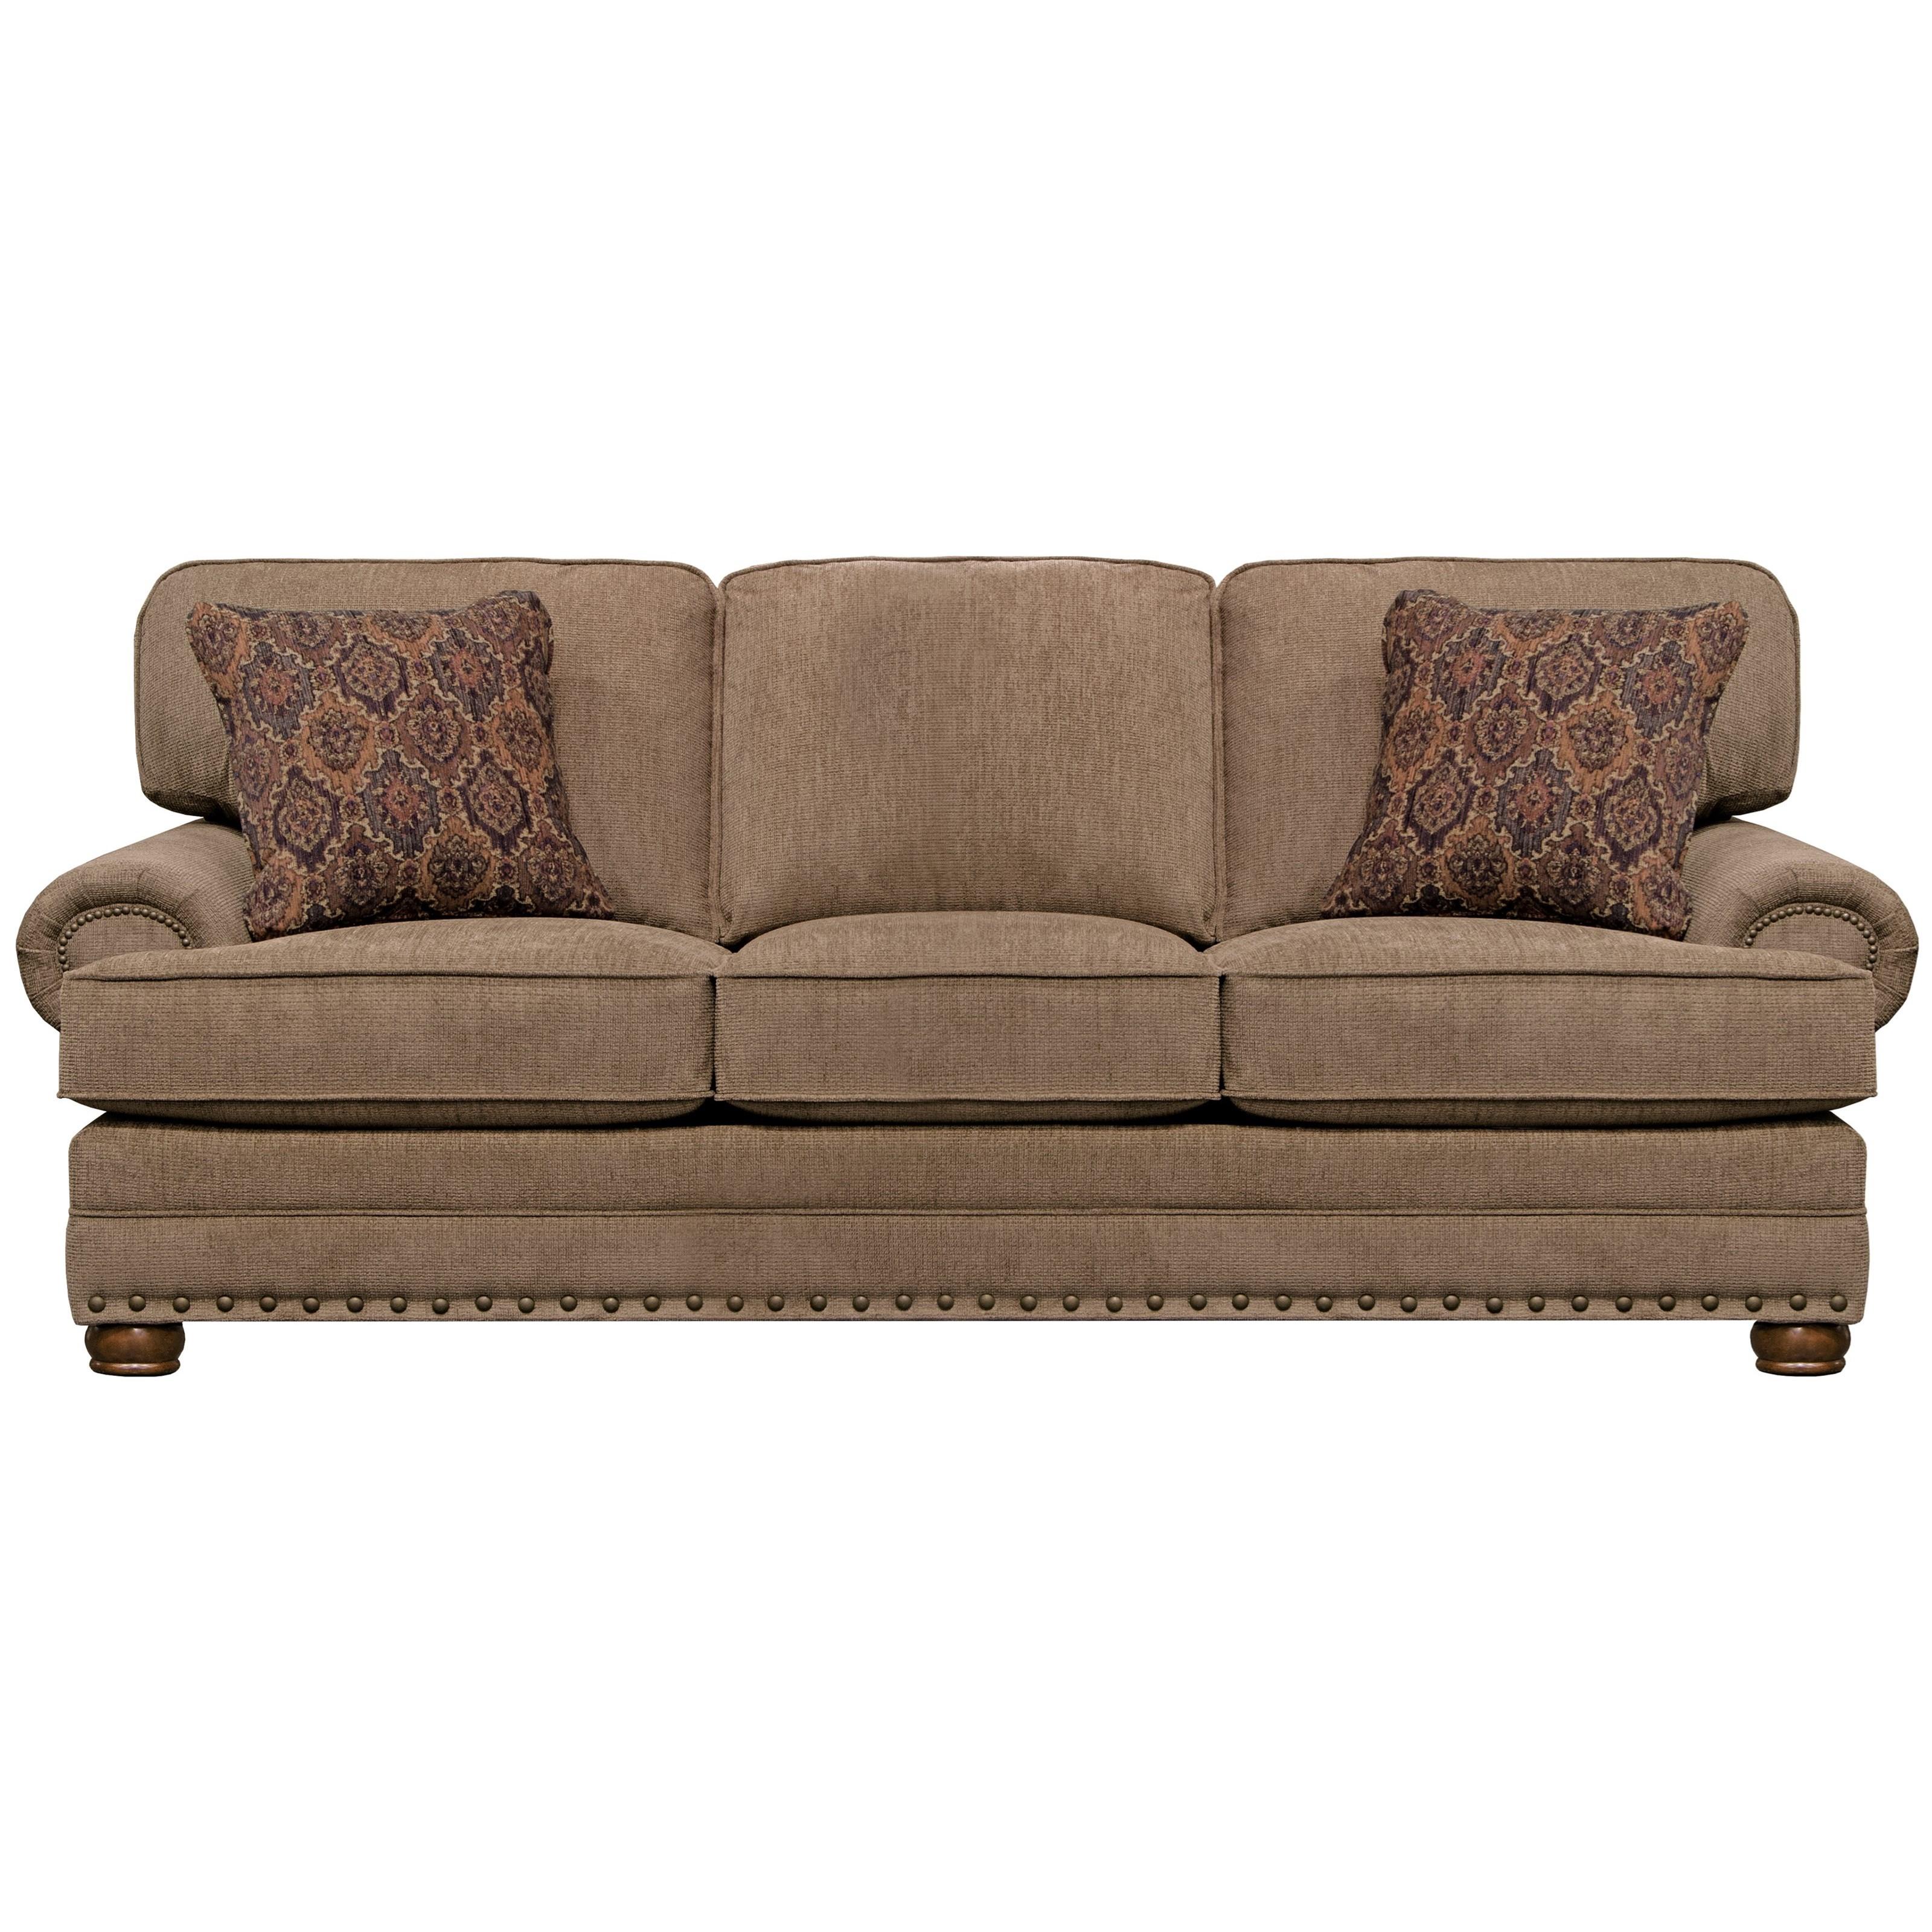 Singletary Sofa by Jackson Furniture at Zak's Home